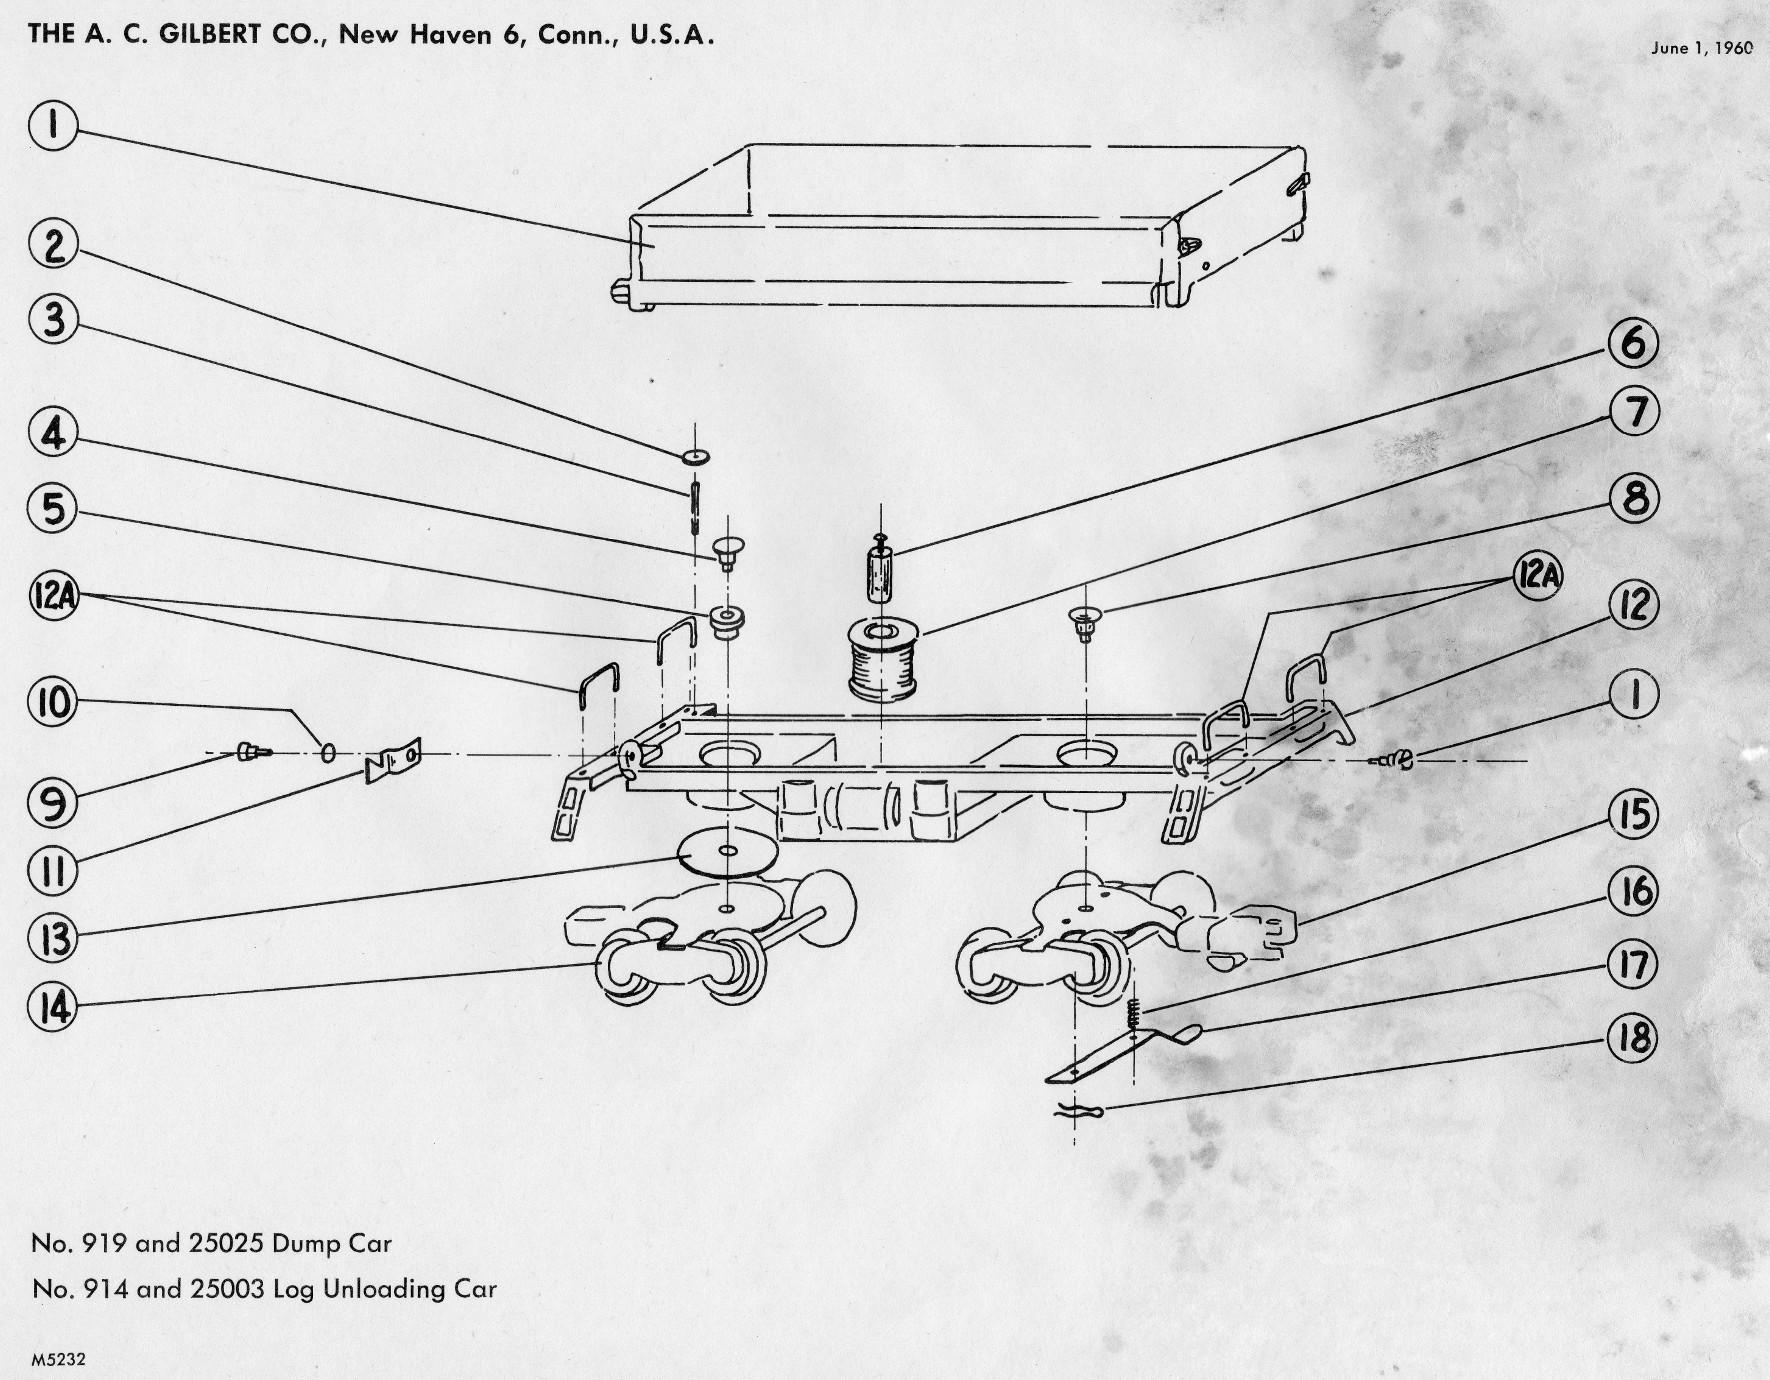 207629746 Daewoo Espero Service Repair Manual 1990 1991 additionally Nissan Note E11 moreover Door Wiring Harness Ford further 2001 Kia Rio Vacuum Diagram as well Zx1200 Wiring Diagram. on car repair diagrams